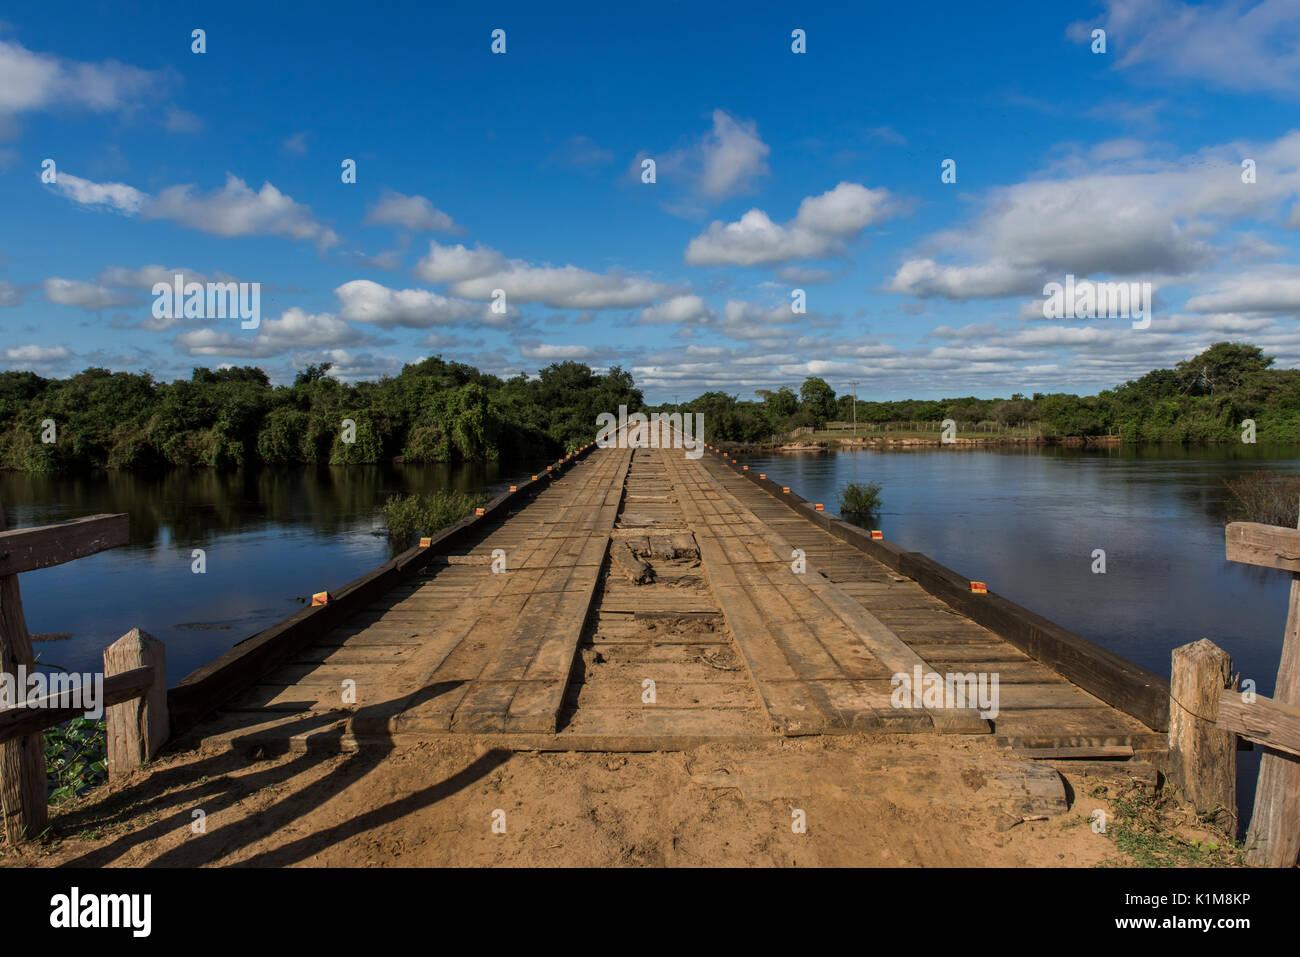 Wooden bridge across the river Rio Negro, Pantanal, Mato Grosso do Sul, Brazil - Stock Image